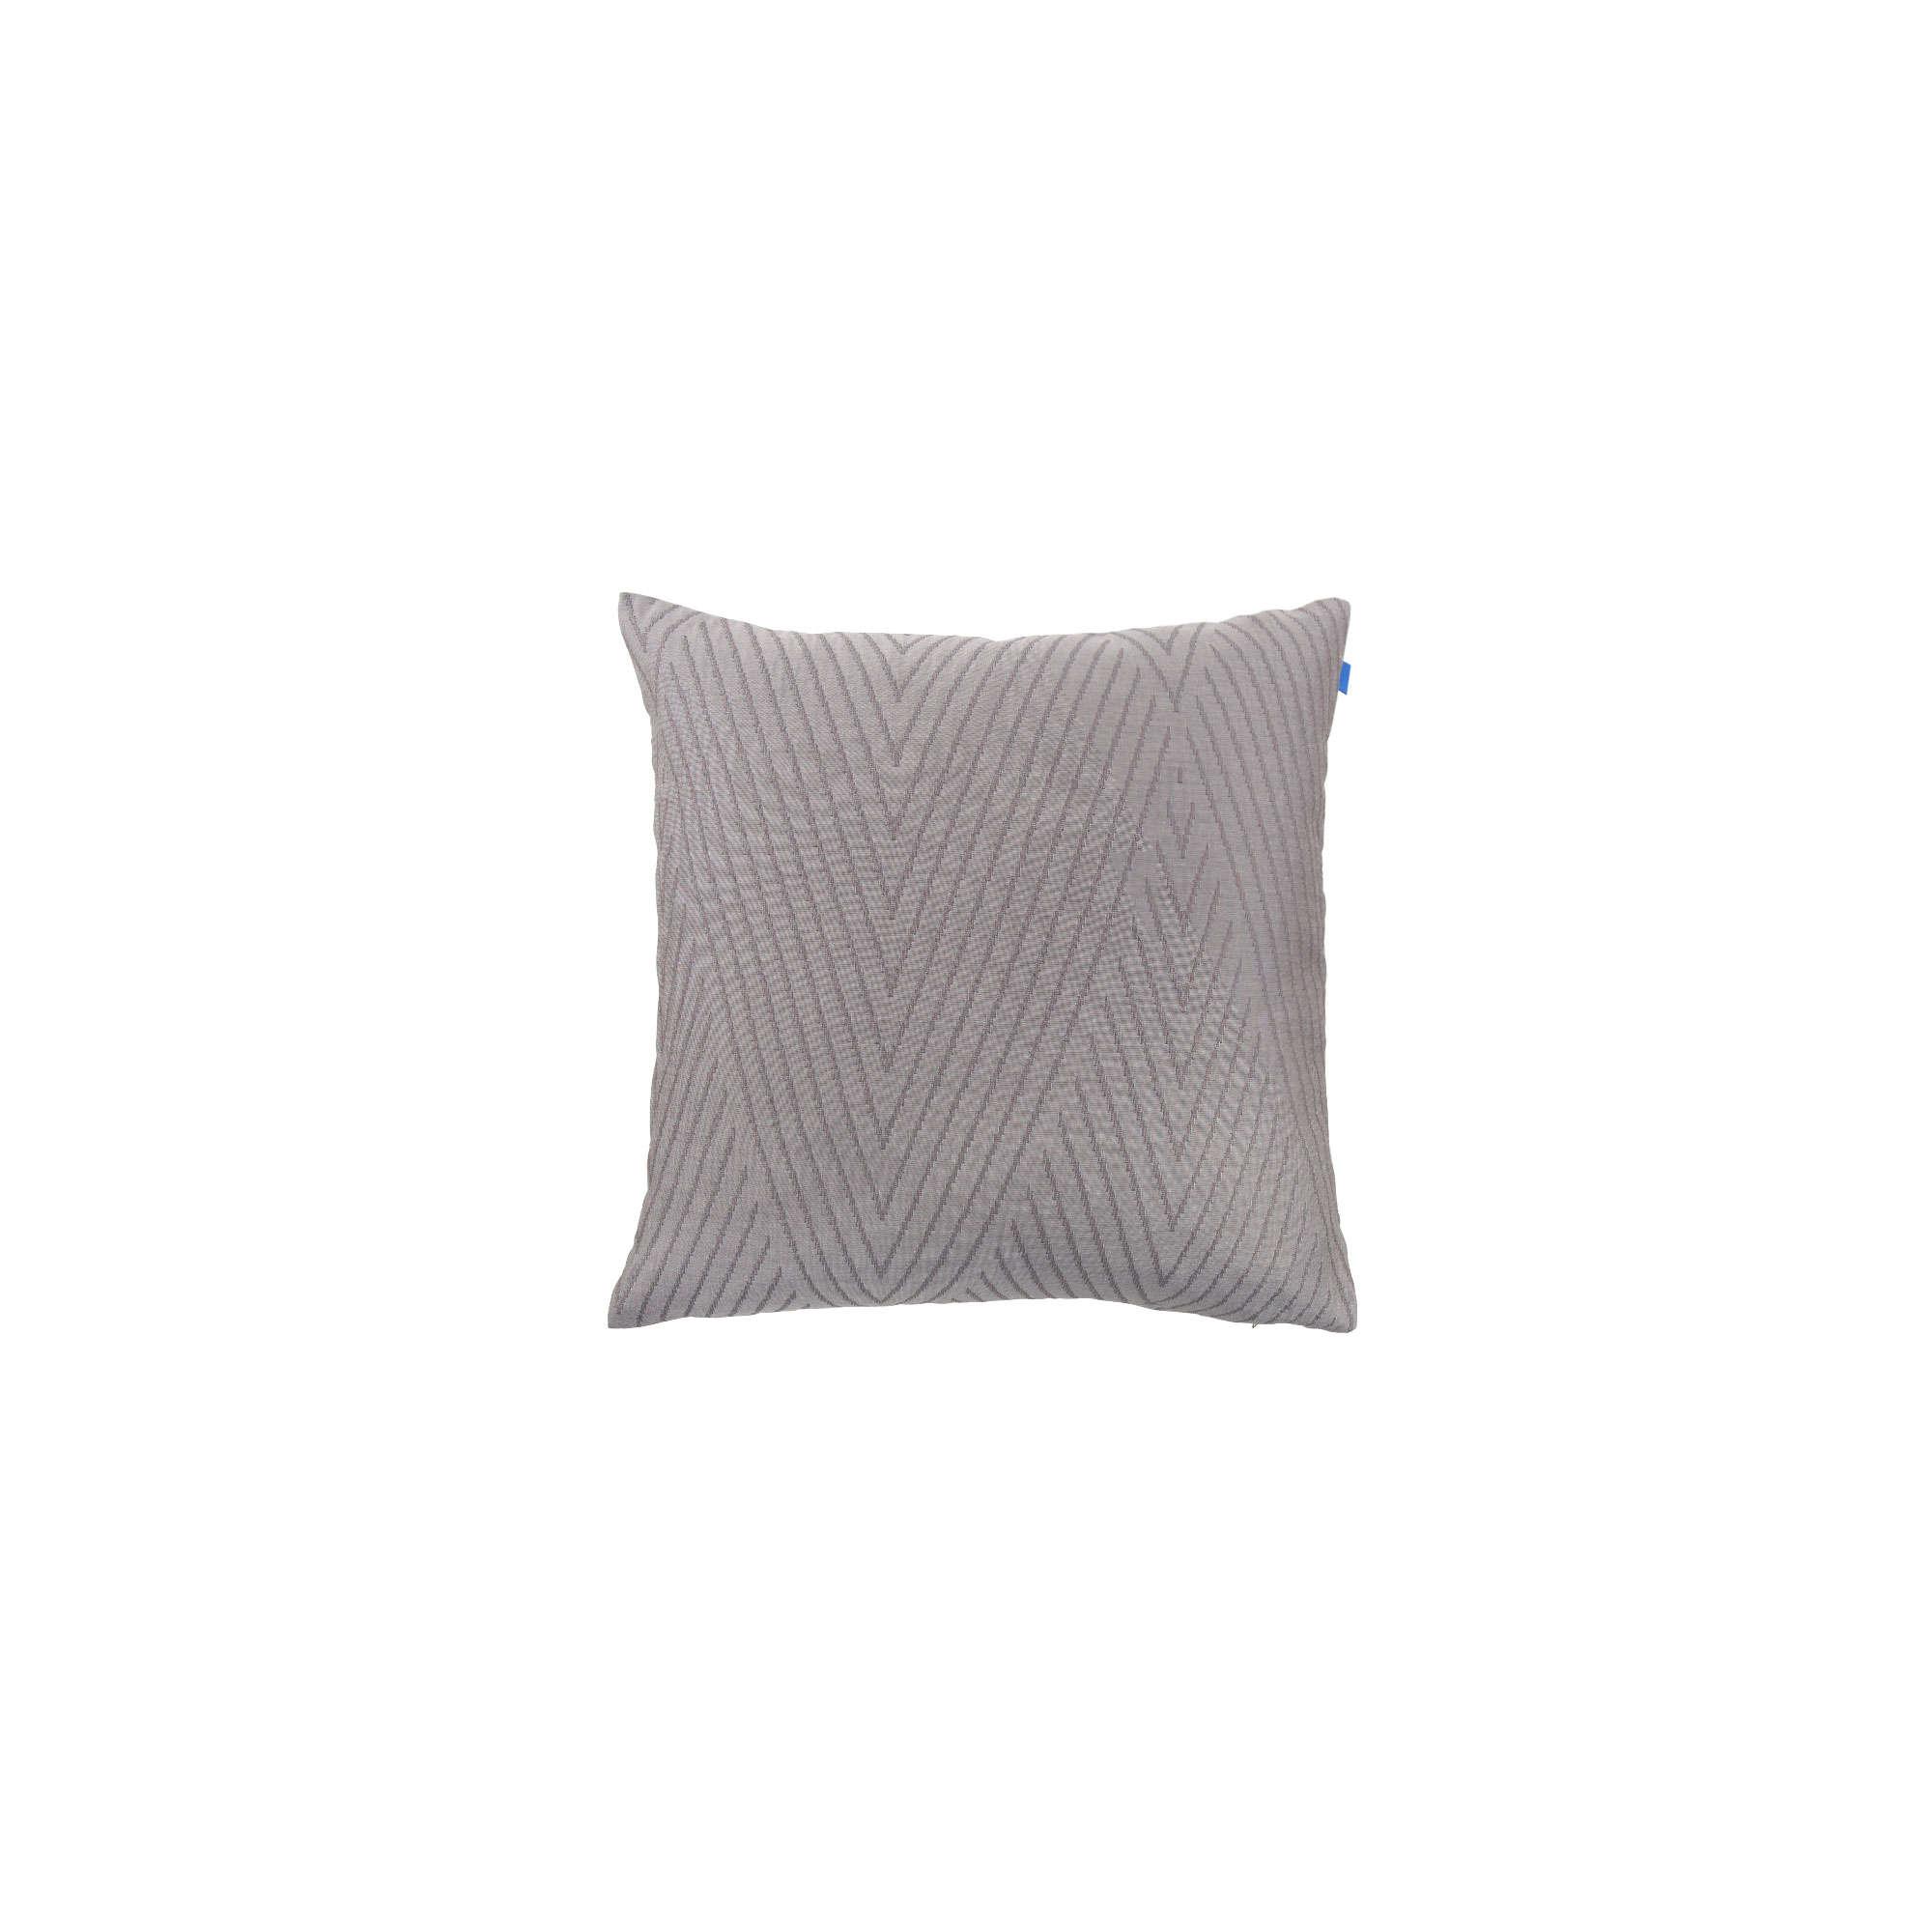 joop kissenh lle special edition grau ebay. Black Bedroom Furniture Sets. Home Design Ideas